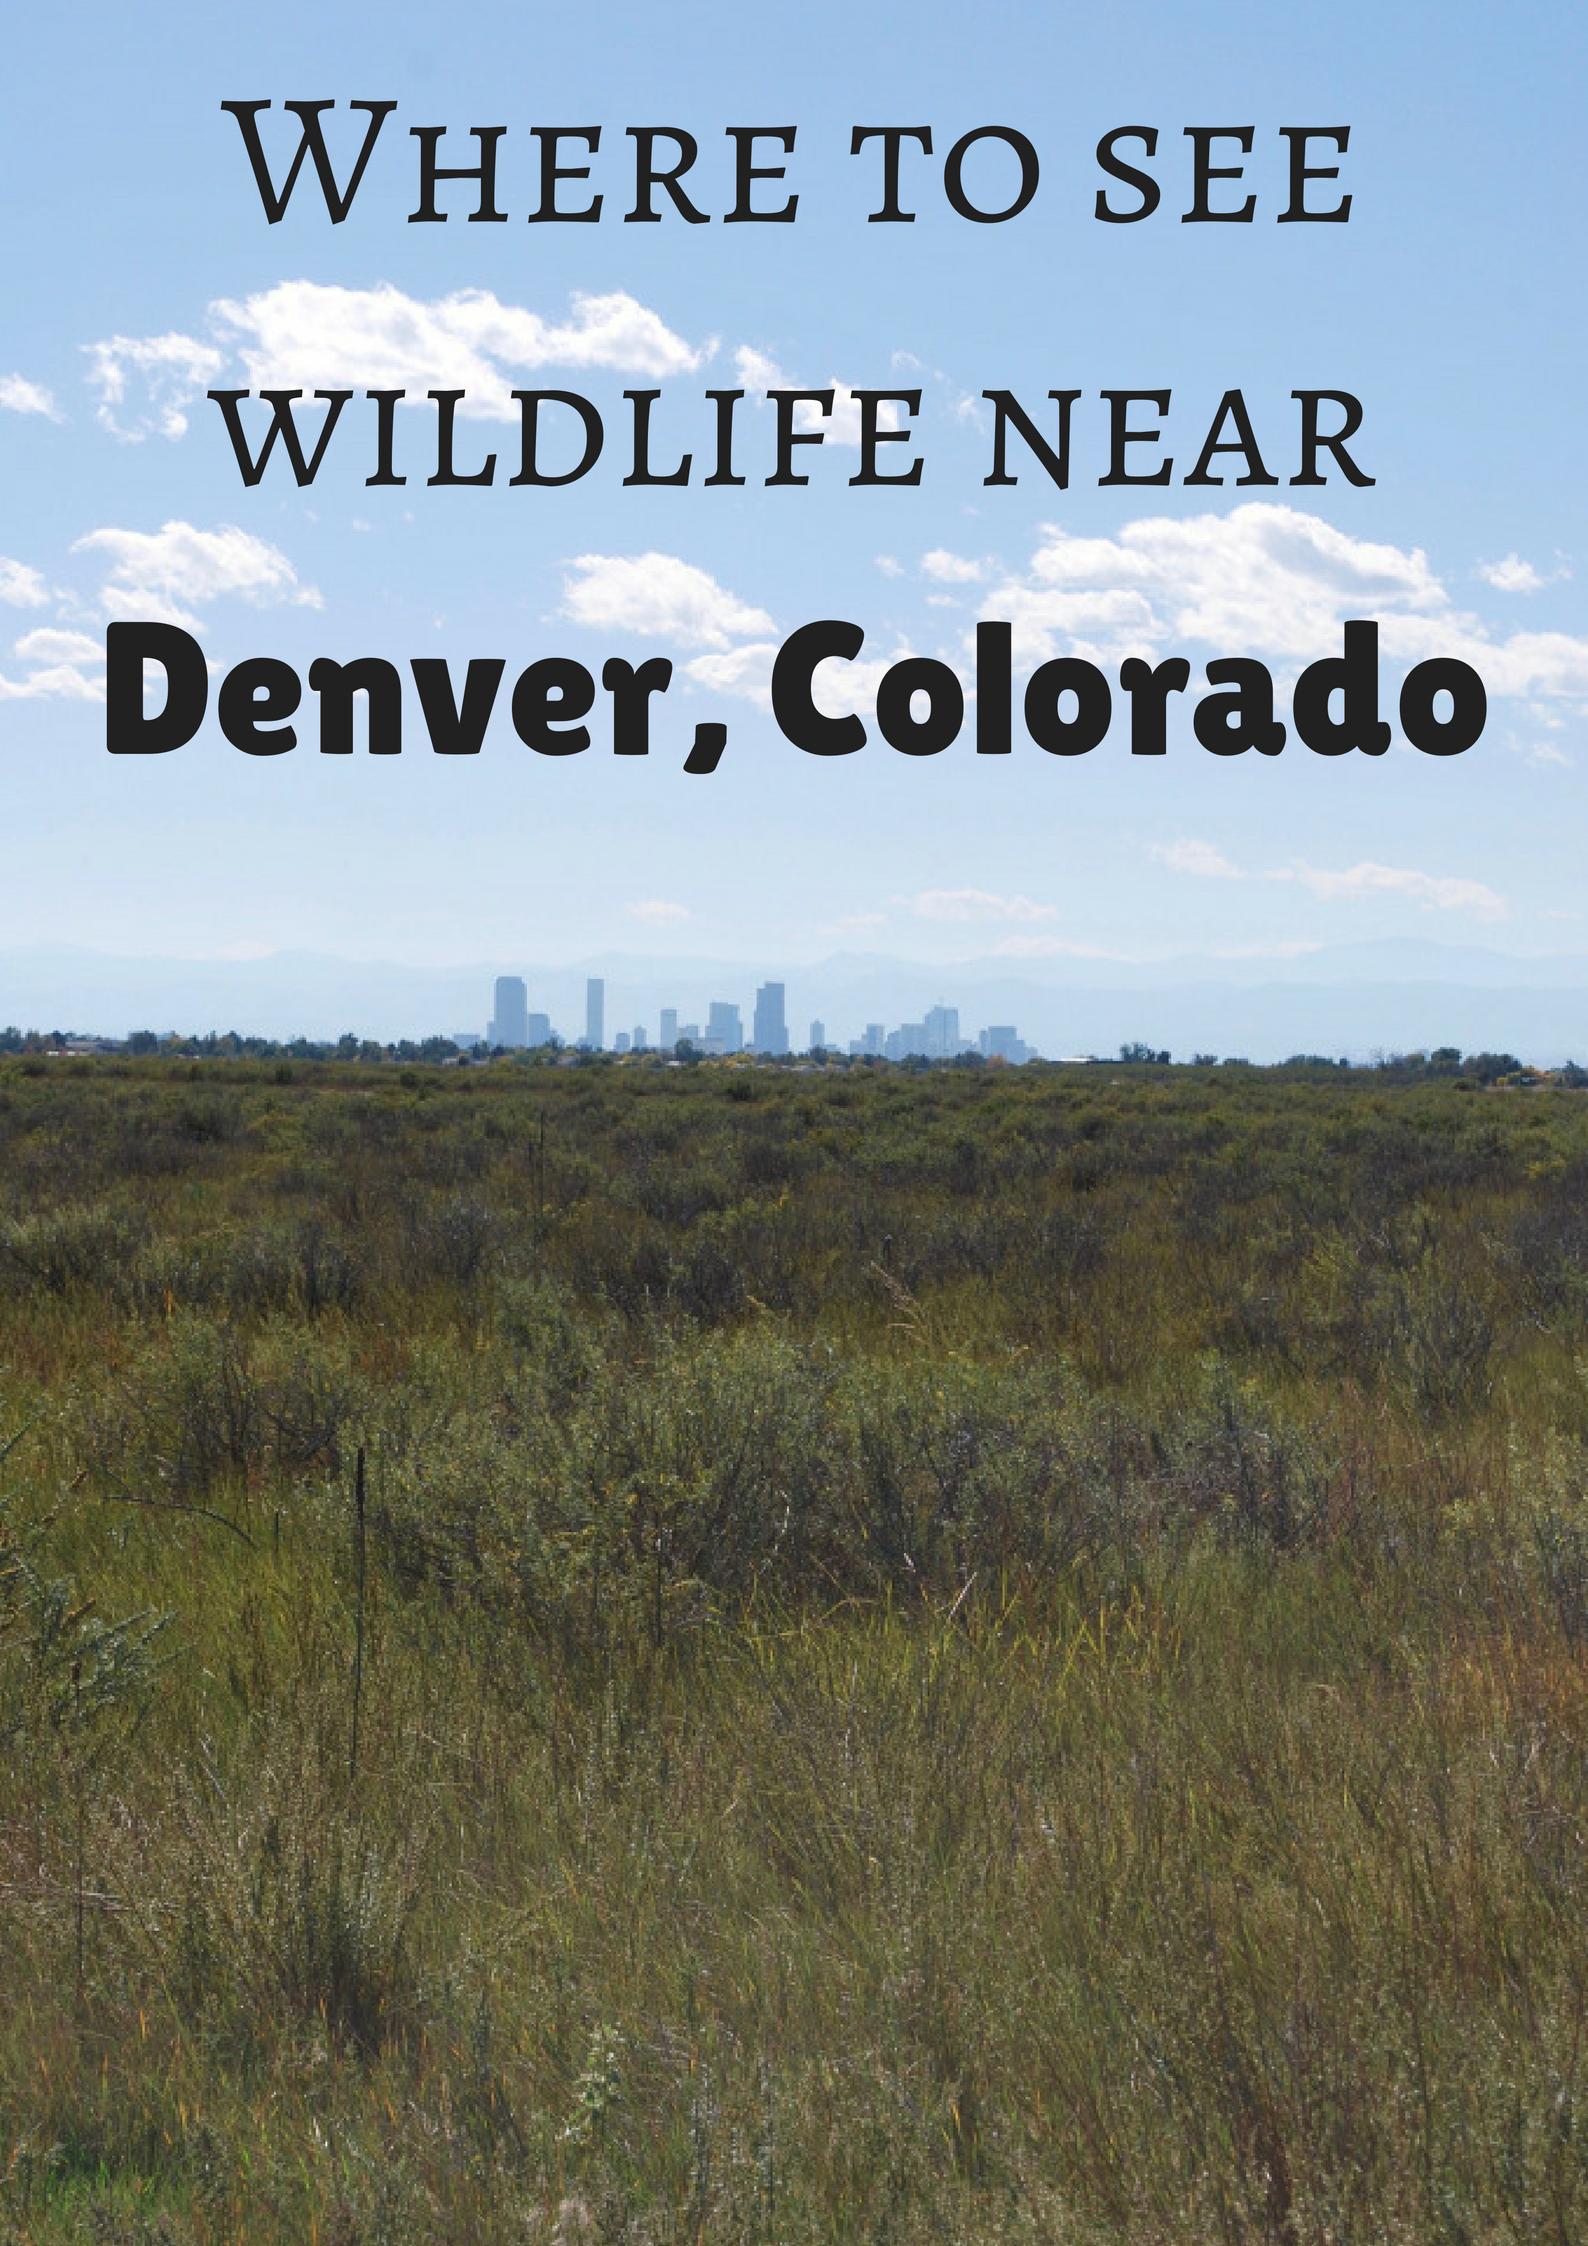 where to see wildlife near denver colorado with images colorado visit denver wildlife pinterest